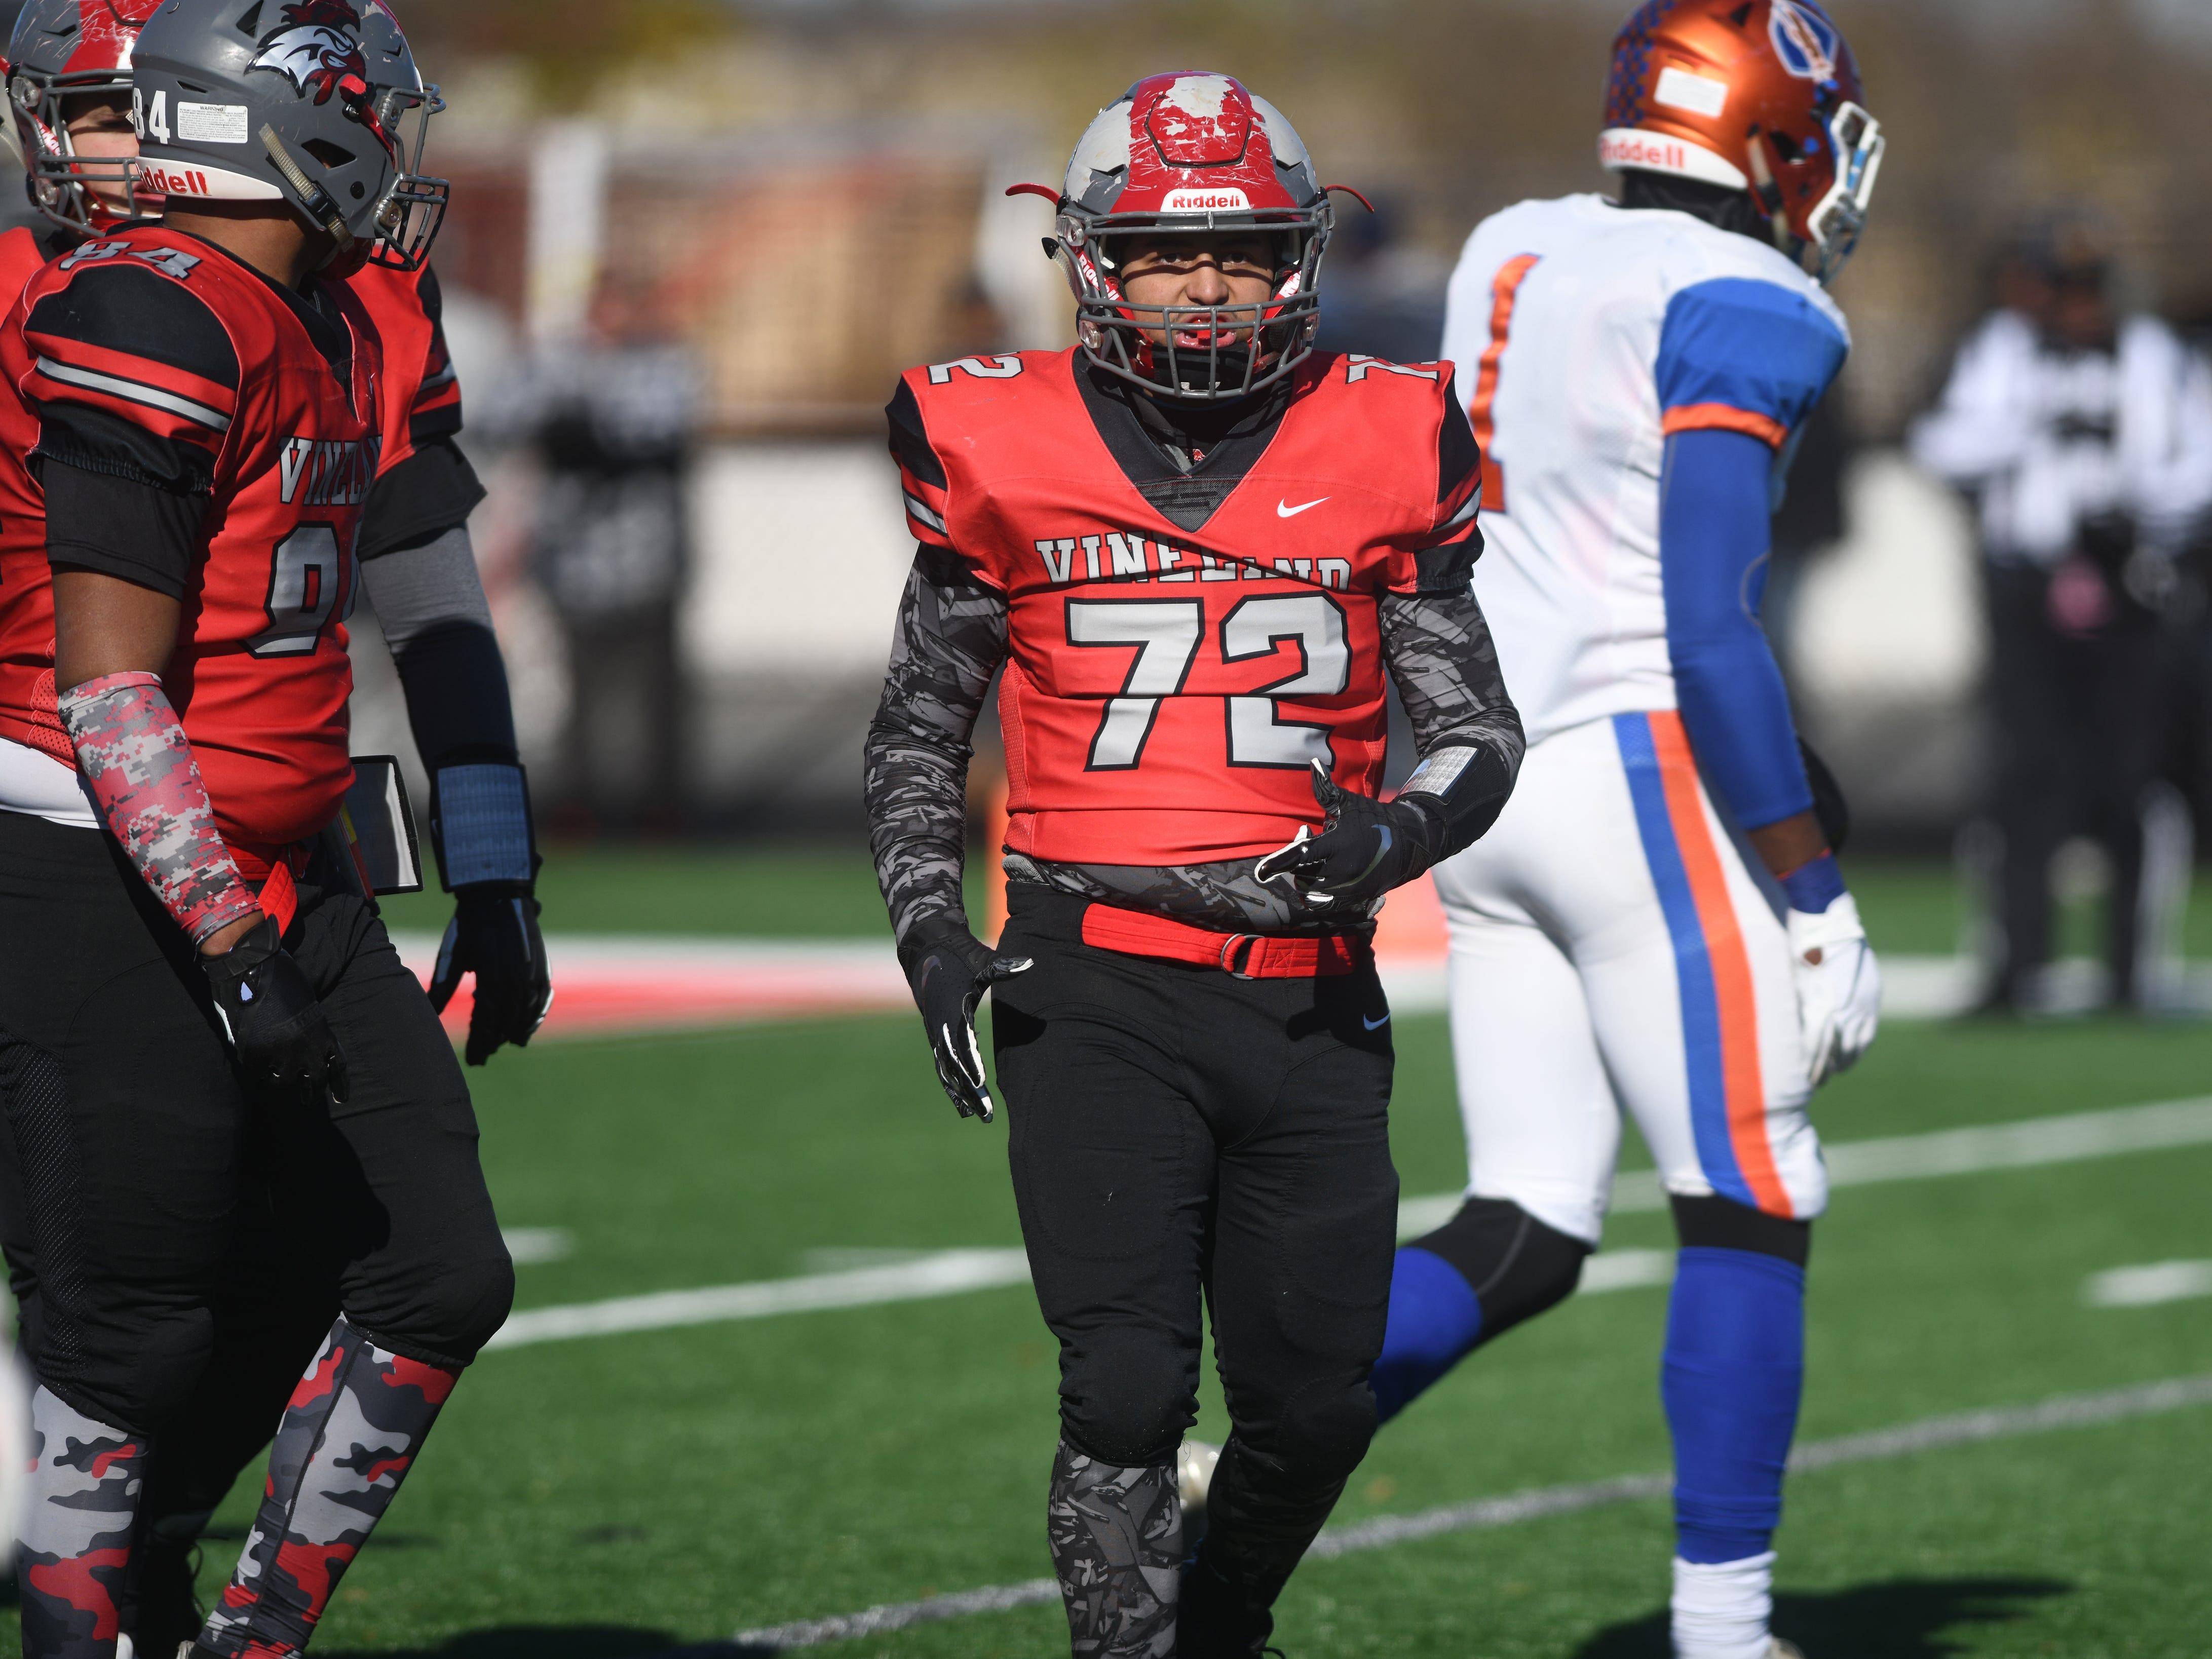 Vineland's Daniel Medina checks the sideline during a game against Millville at Gittone Stadium on Thanksgiving Day.